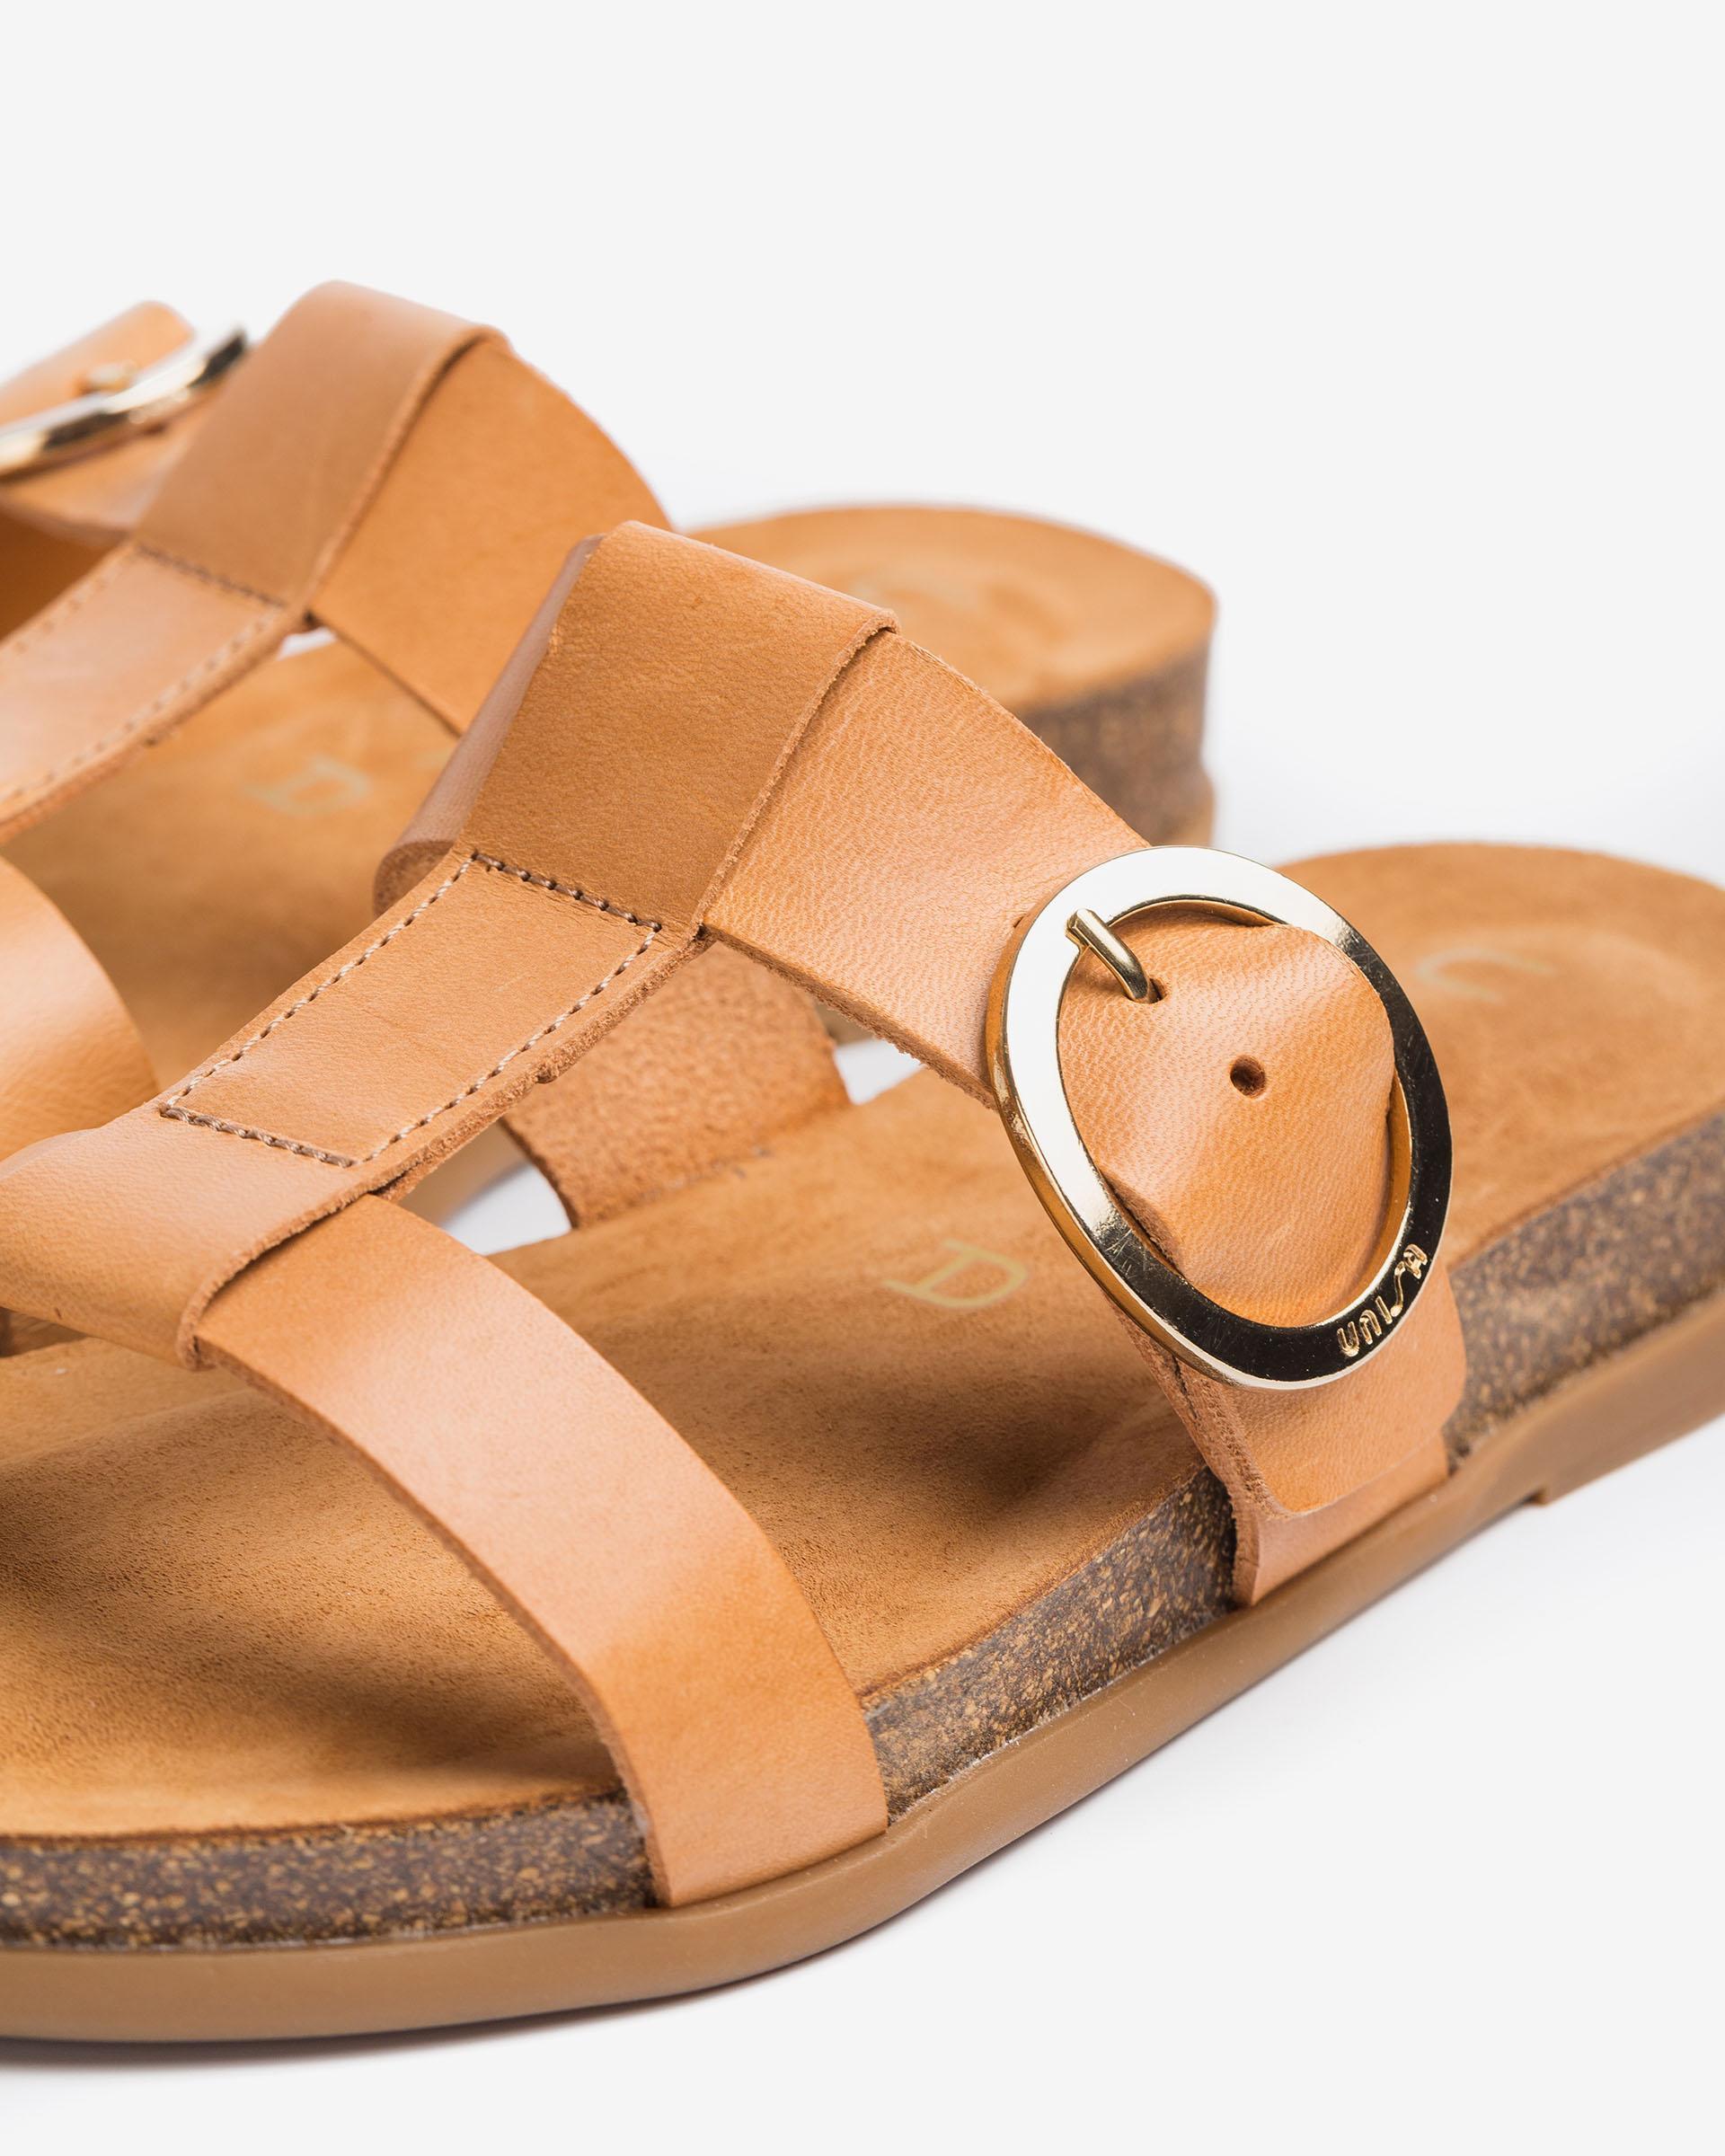 UNISA Buckle leather sandals with cork platform CIVETA_RAN 2